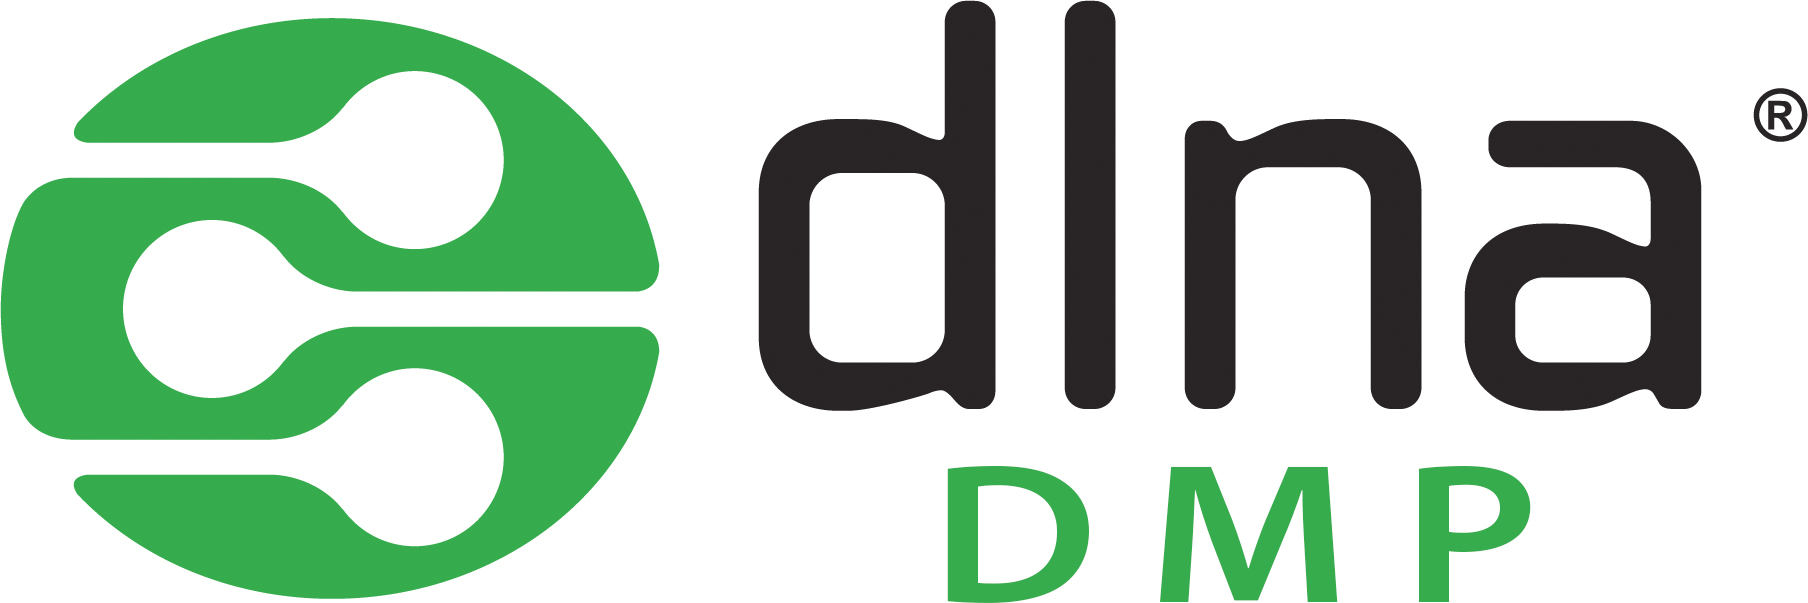 DLNA-شبکه دیجیتال-استاندارد DLNA -Digital Living Network Alliance